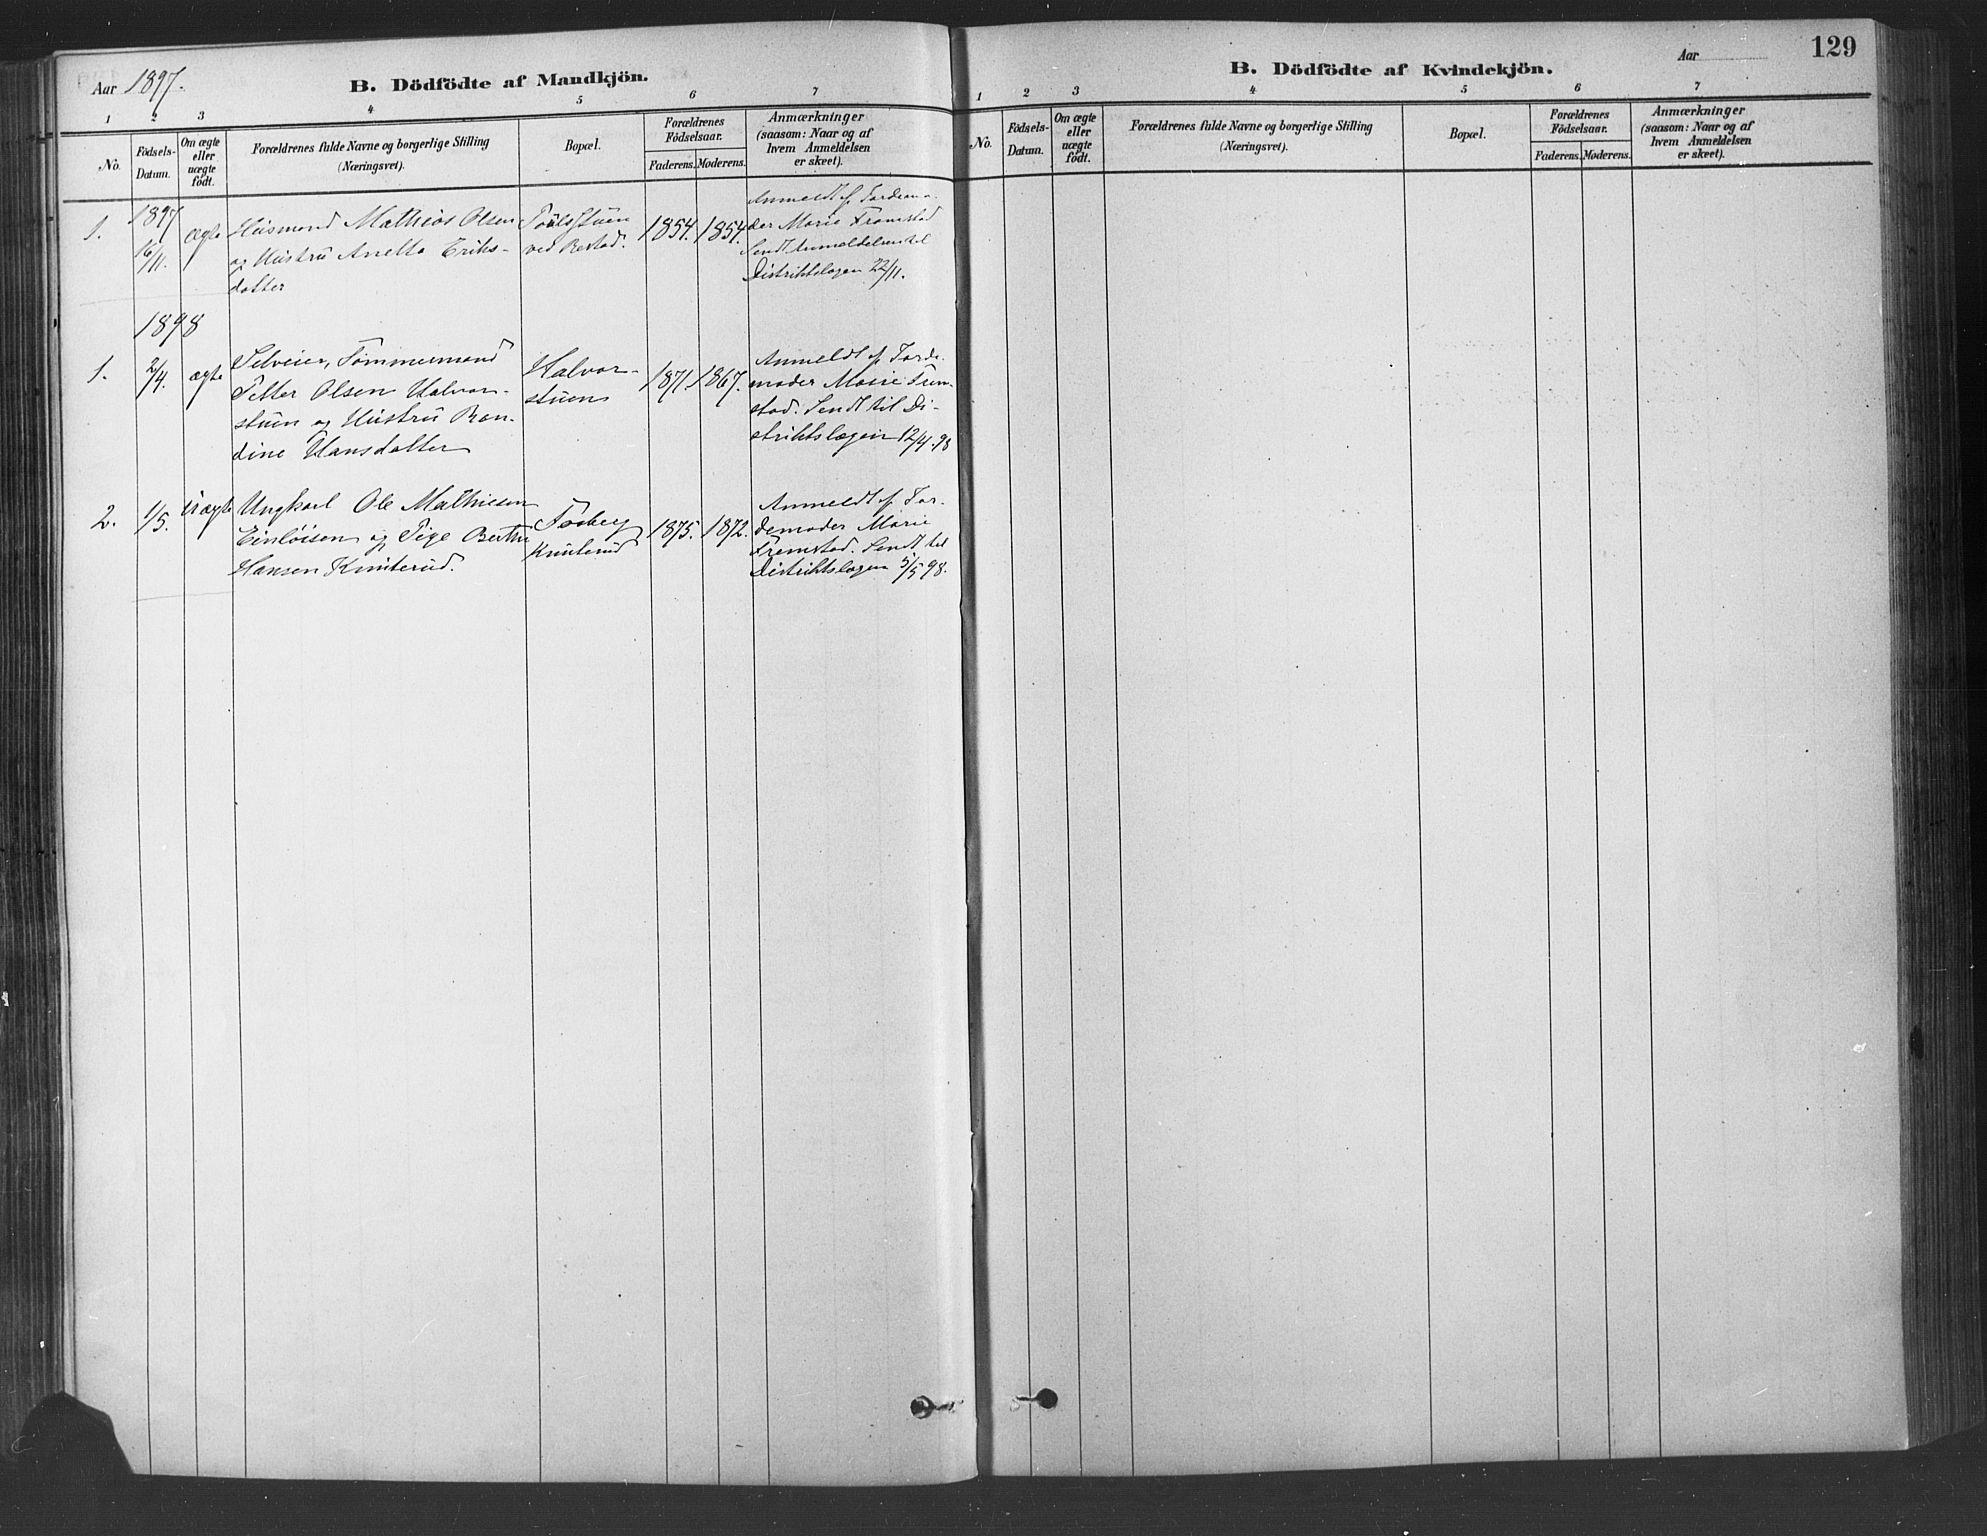 SAH, Fåberg prestekontor, Ministerialbok nr. 9, 1879-1898, s. 129